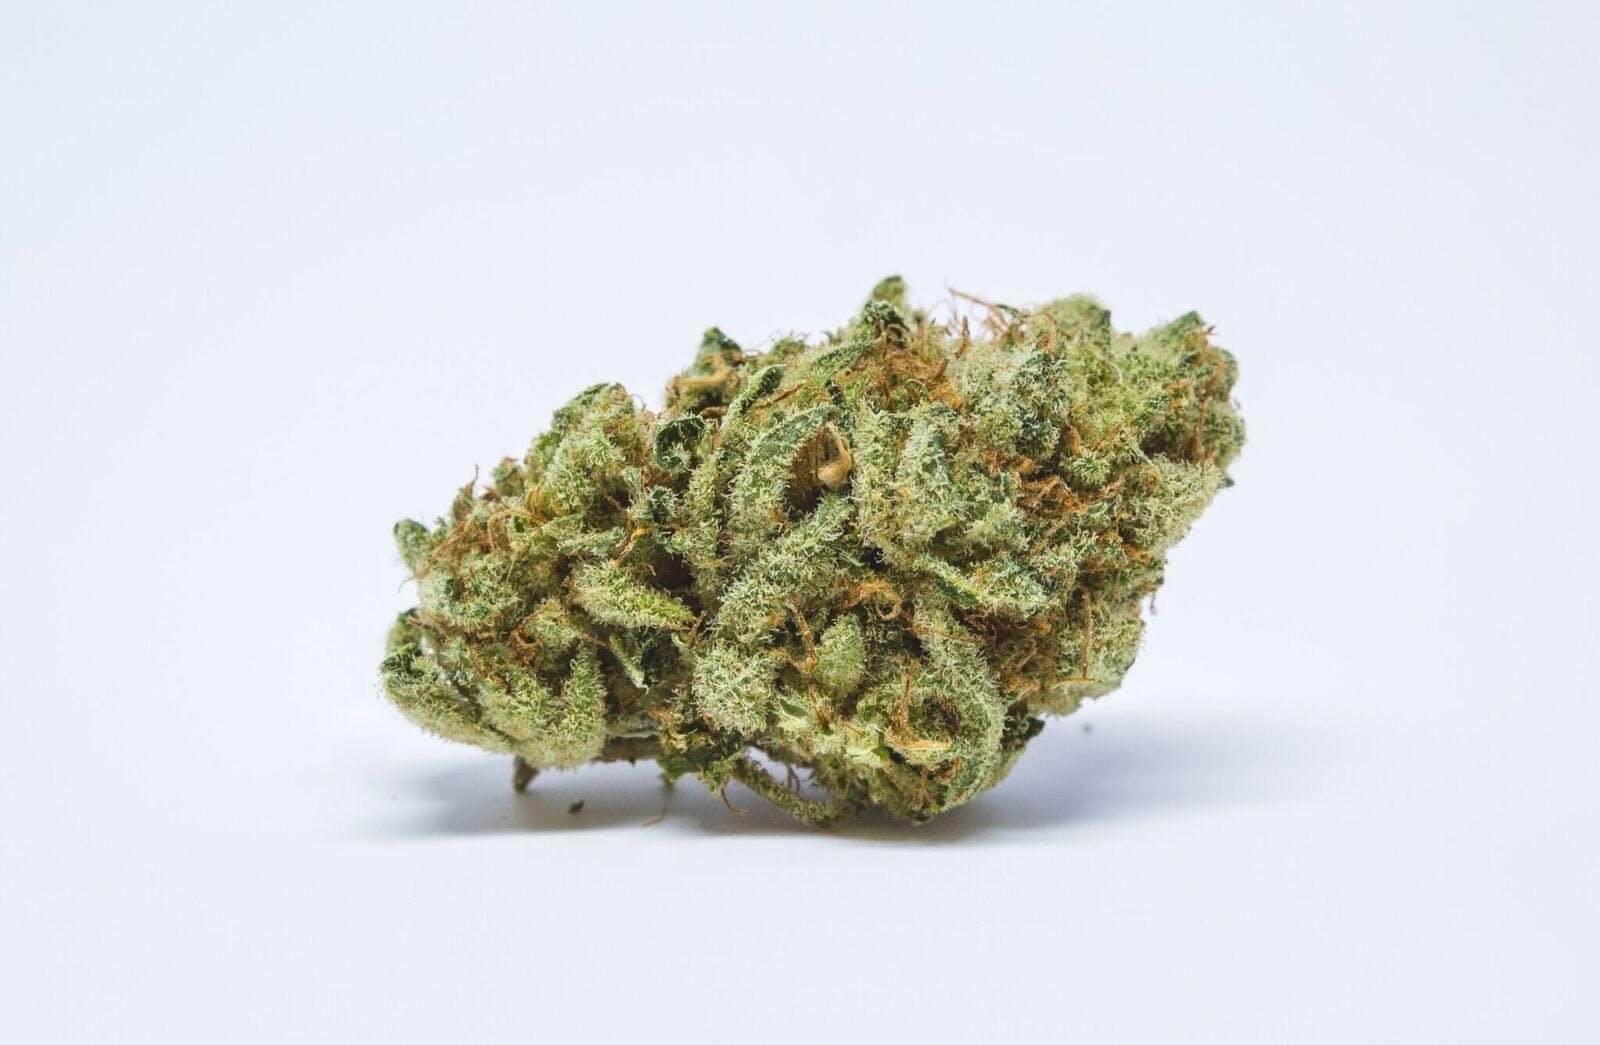 Sugar Kush Weed; Sugar Kush Cannabis Strain; Sugar Kush Indica Marijuana Strain